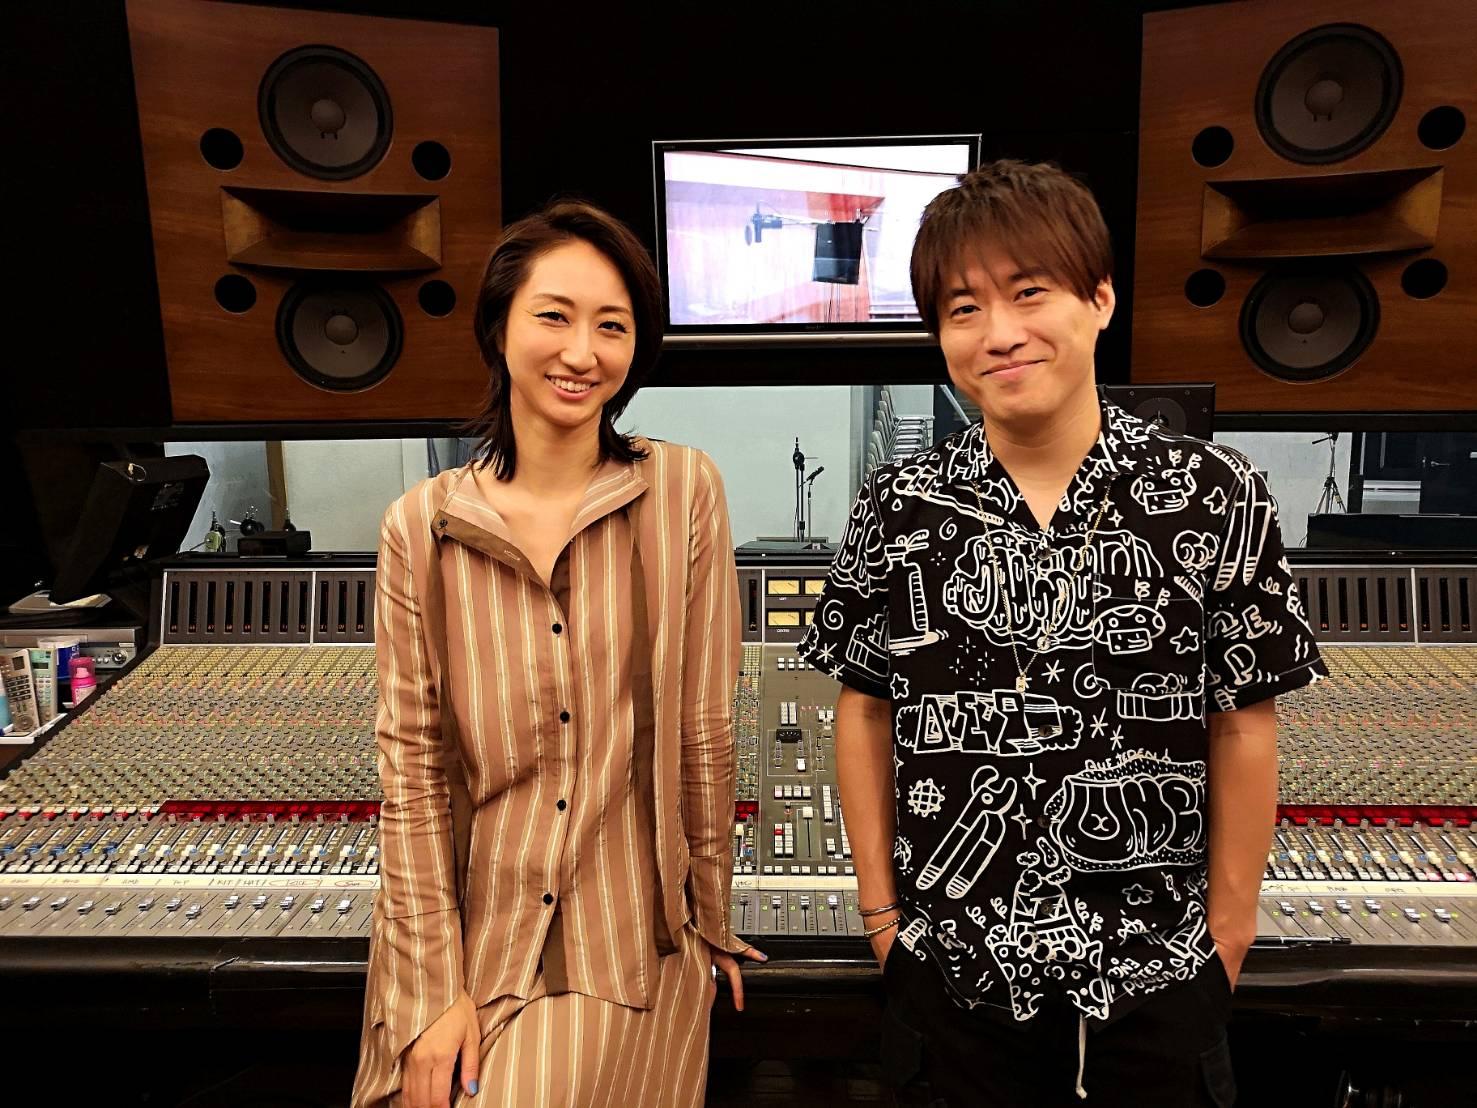 Ms.OOJAの全国ホールワンマンツアー東京公演に、小渕健太郎(コブクロ)の出演が決定サムネイル画像